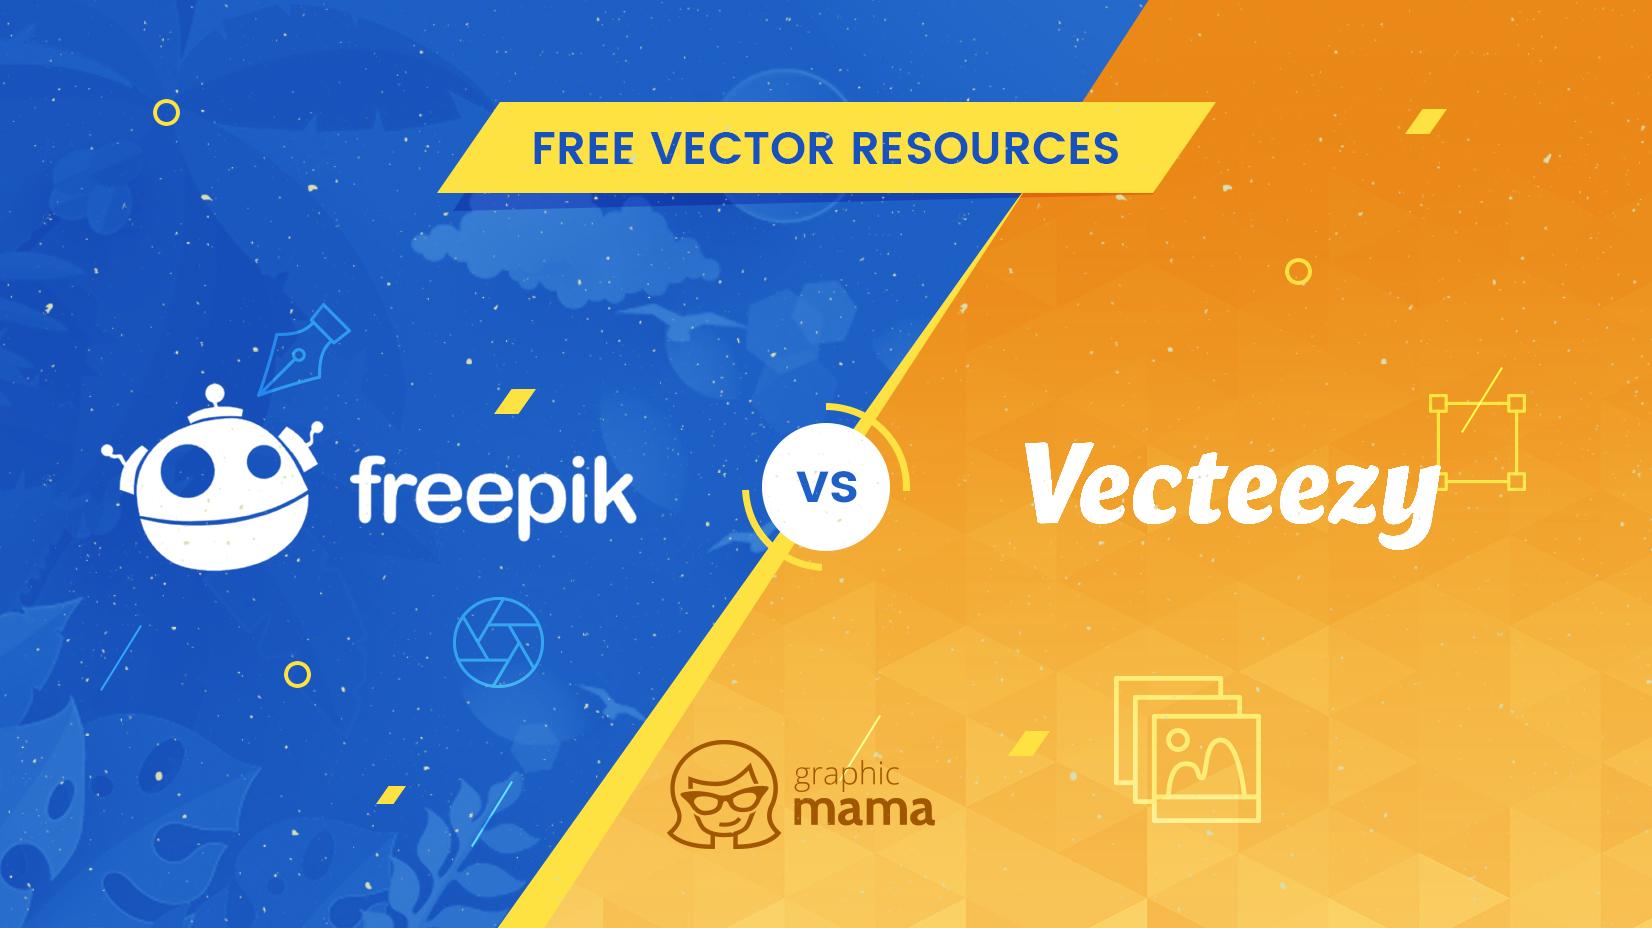 1652x928 Freepik Vs Vecteezy Which One To Choose Graphicmama Blog